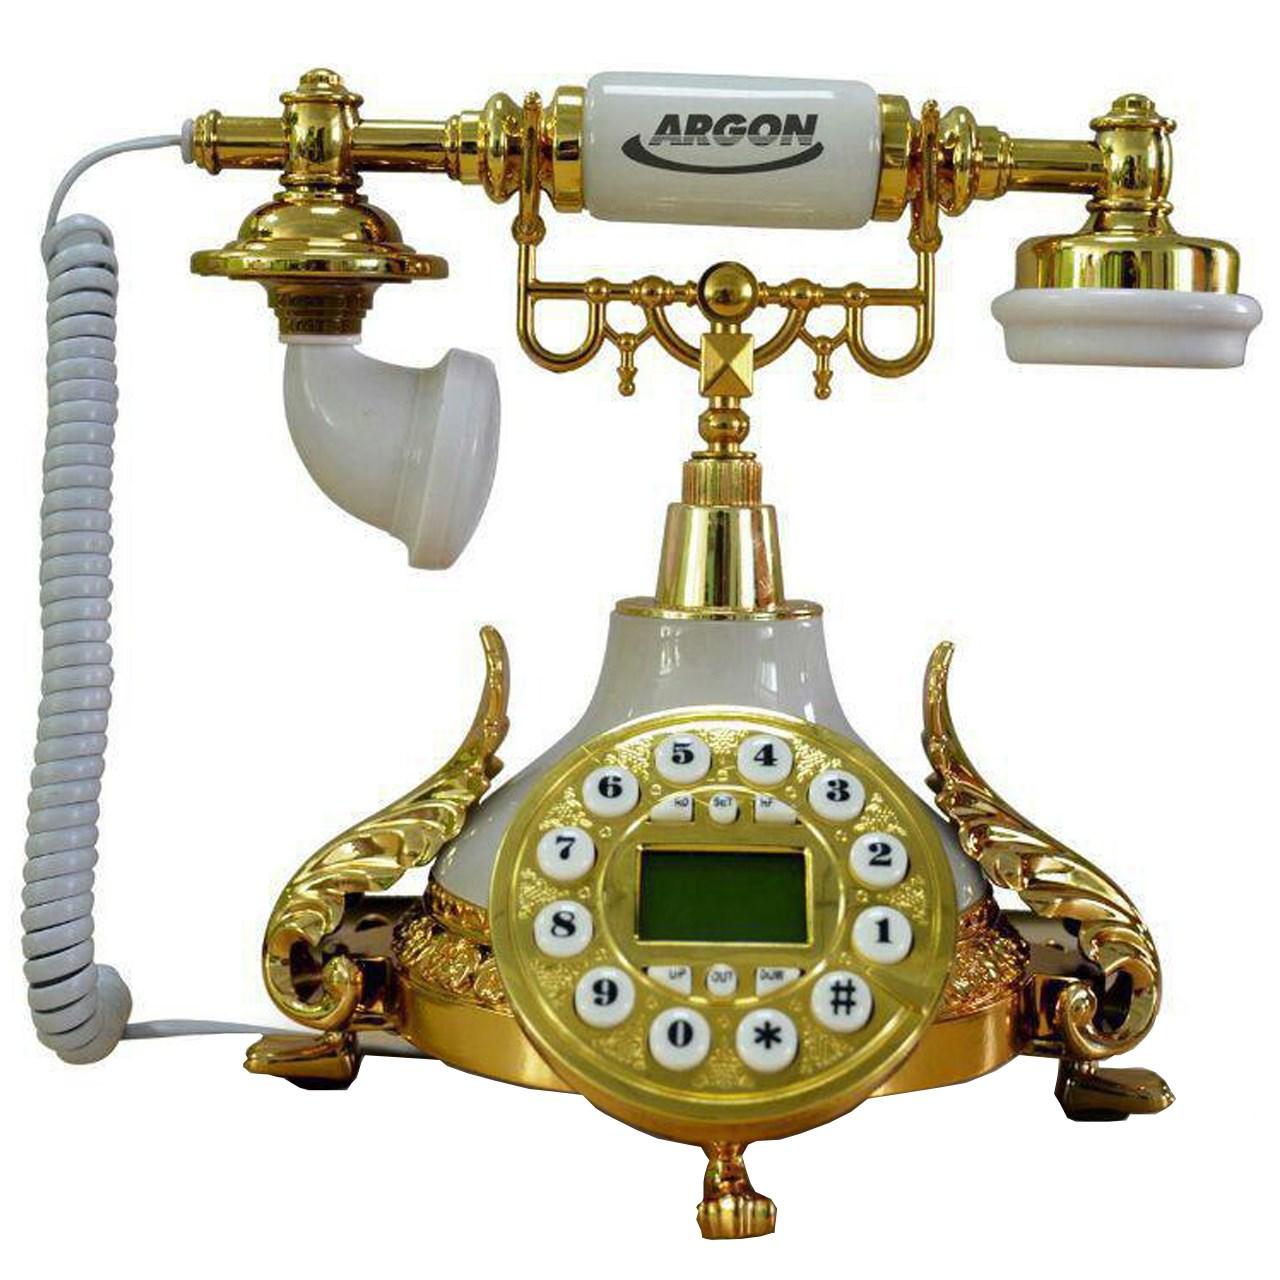 قیمت                      تلفن آرگون آنتیک مدل AR- 205